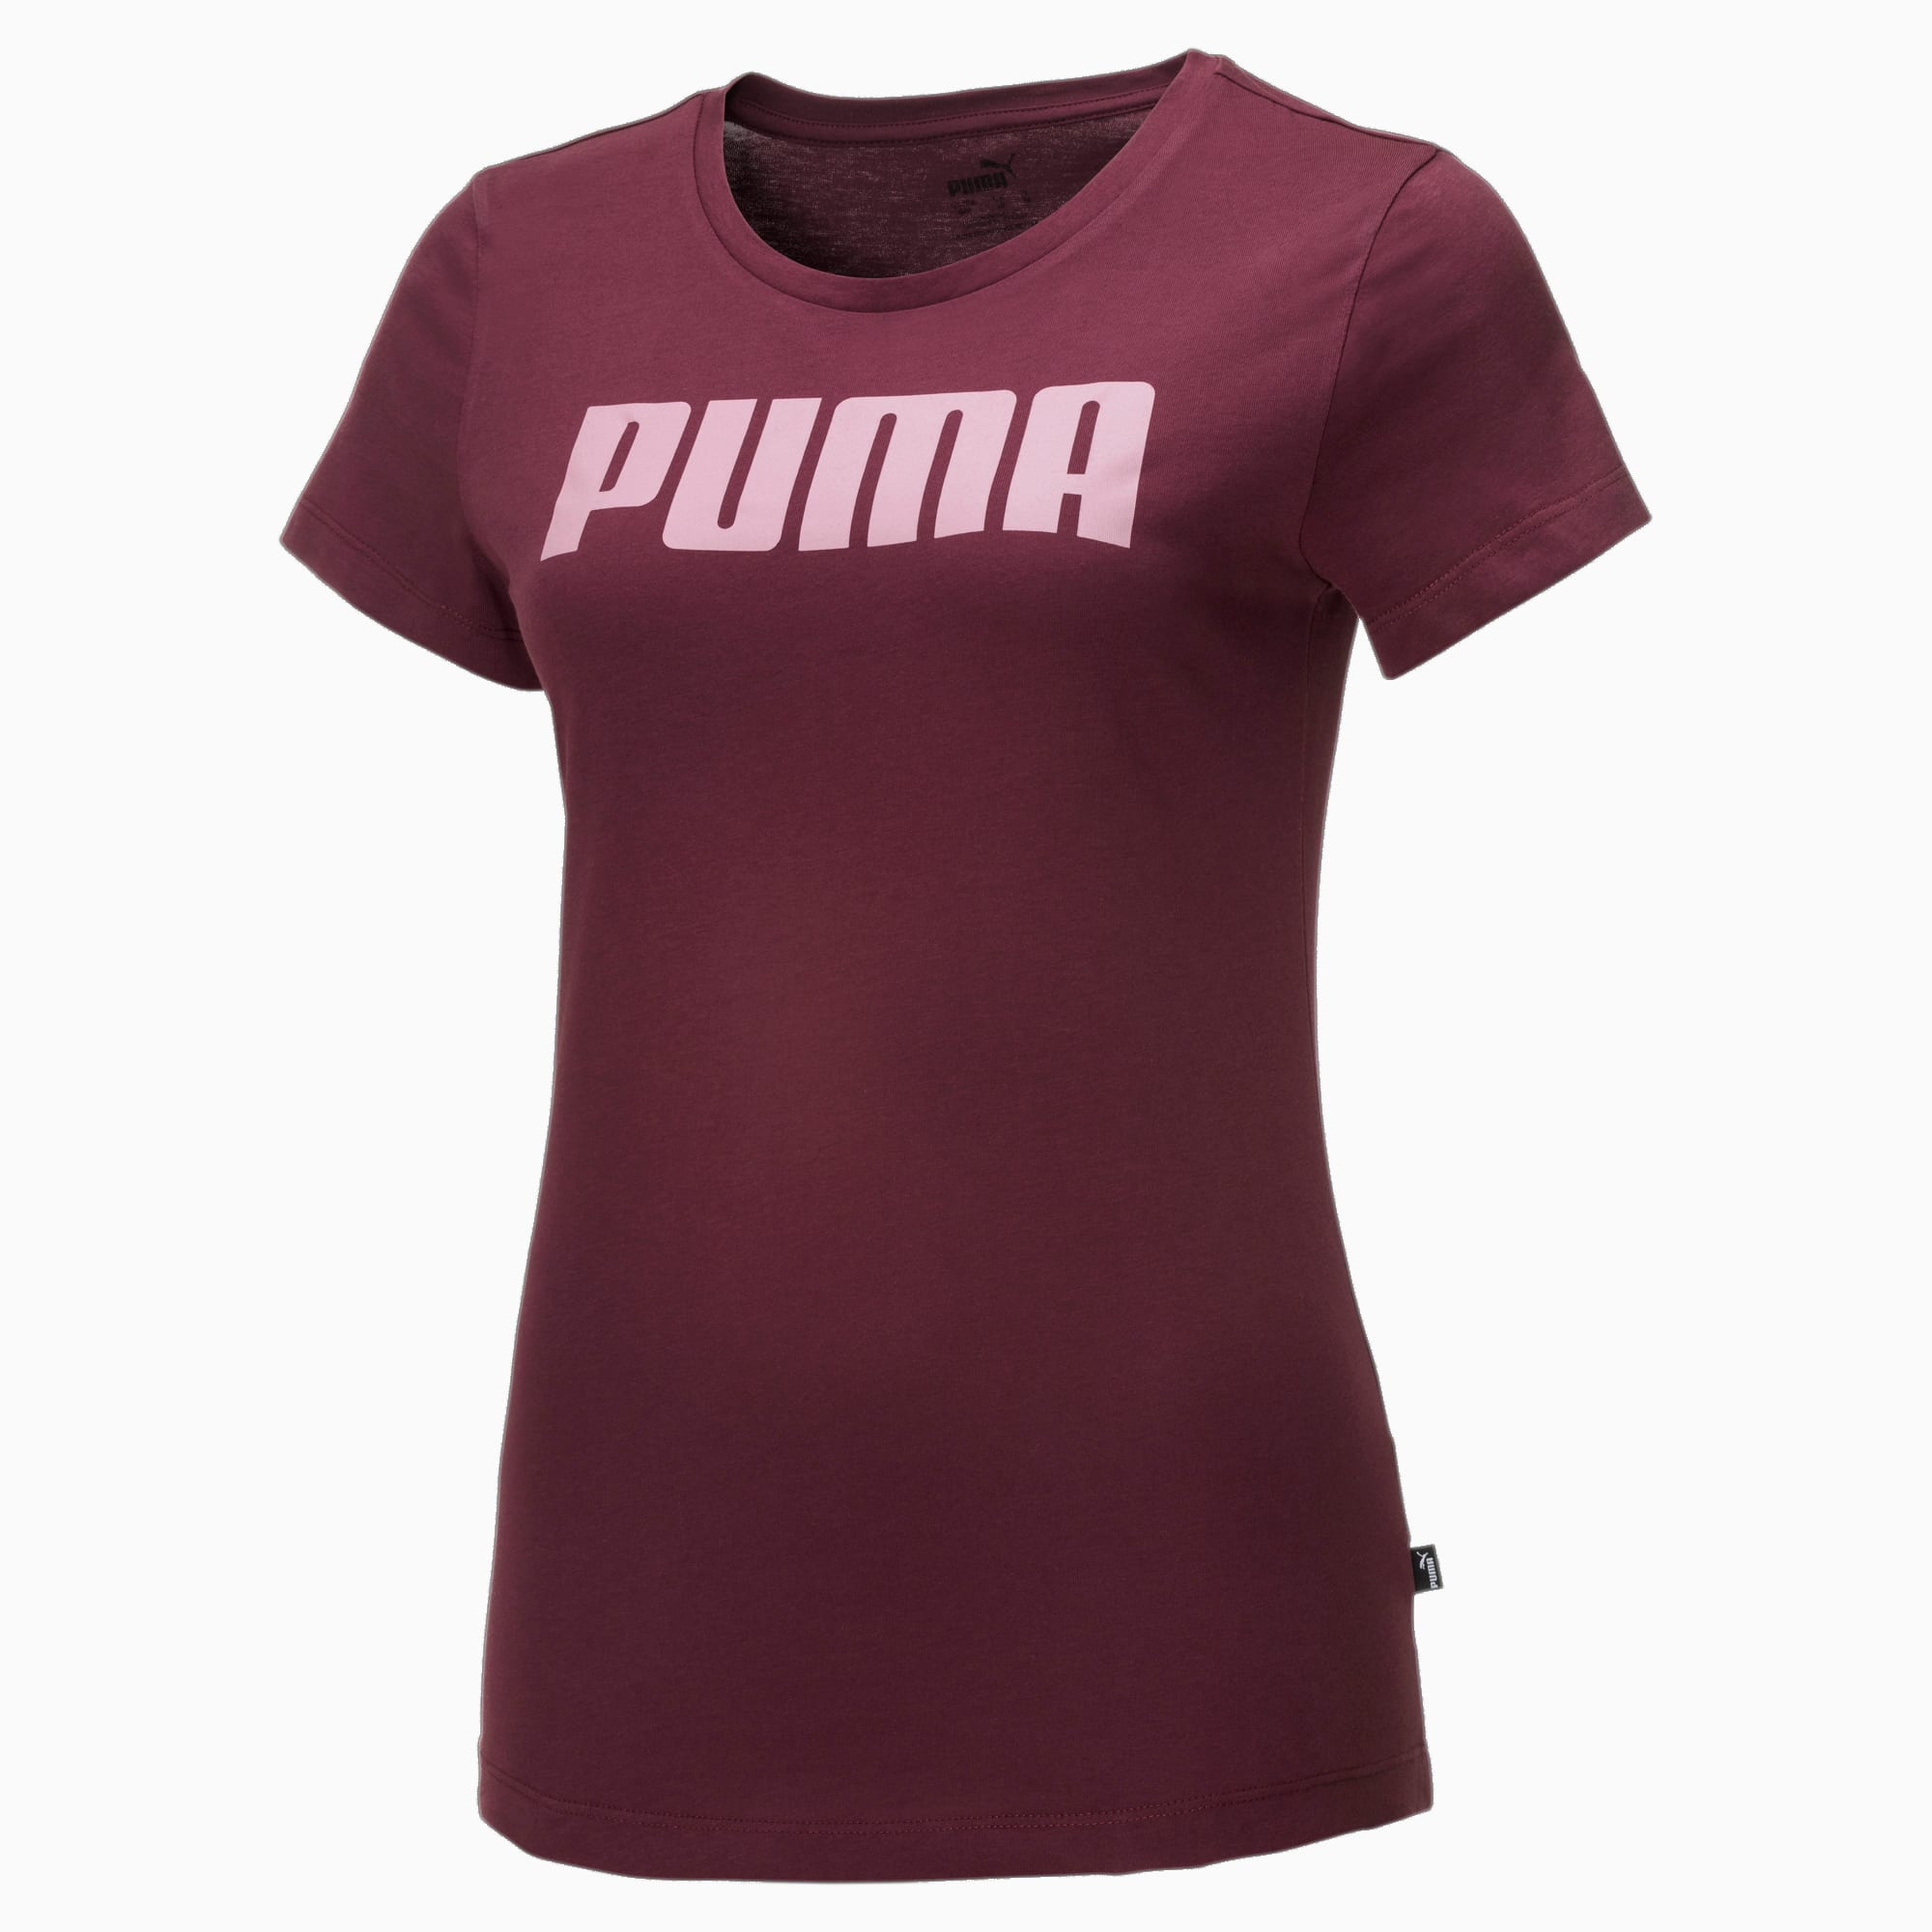 Essentials T-shirt voor Dames, Rood, Maat M | PUMA